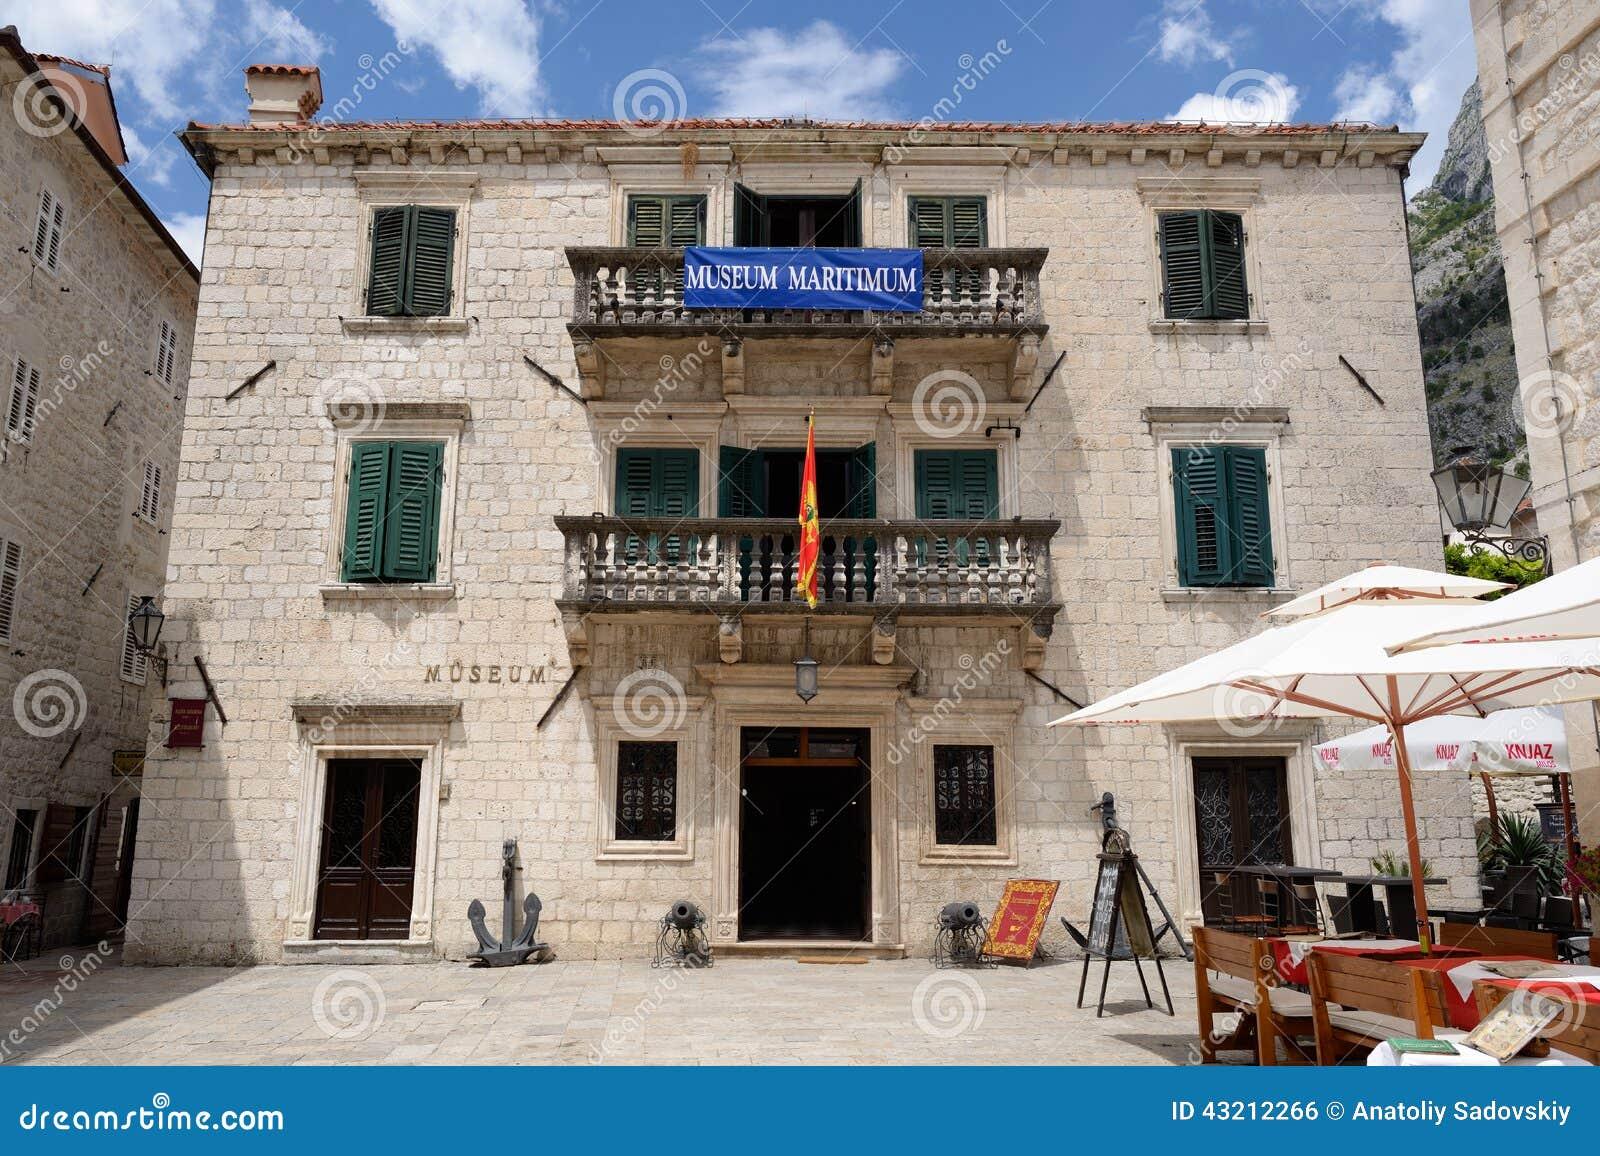 Maritime museum of montenegro in kotor editorial photo for Hotel design kotor